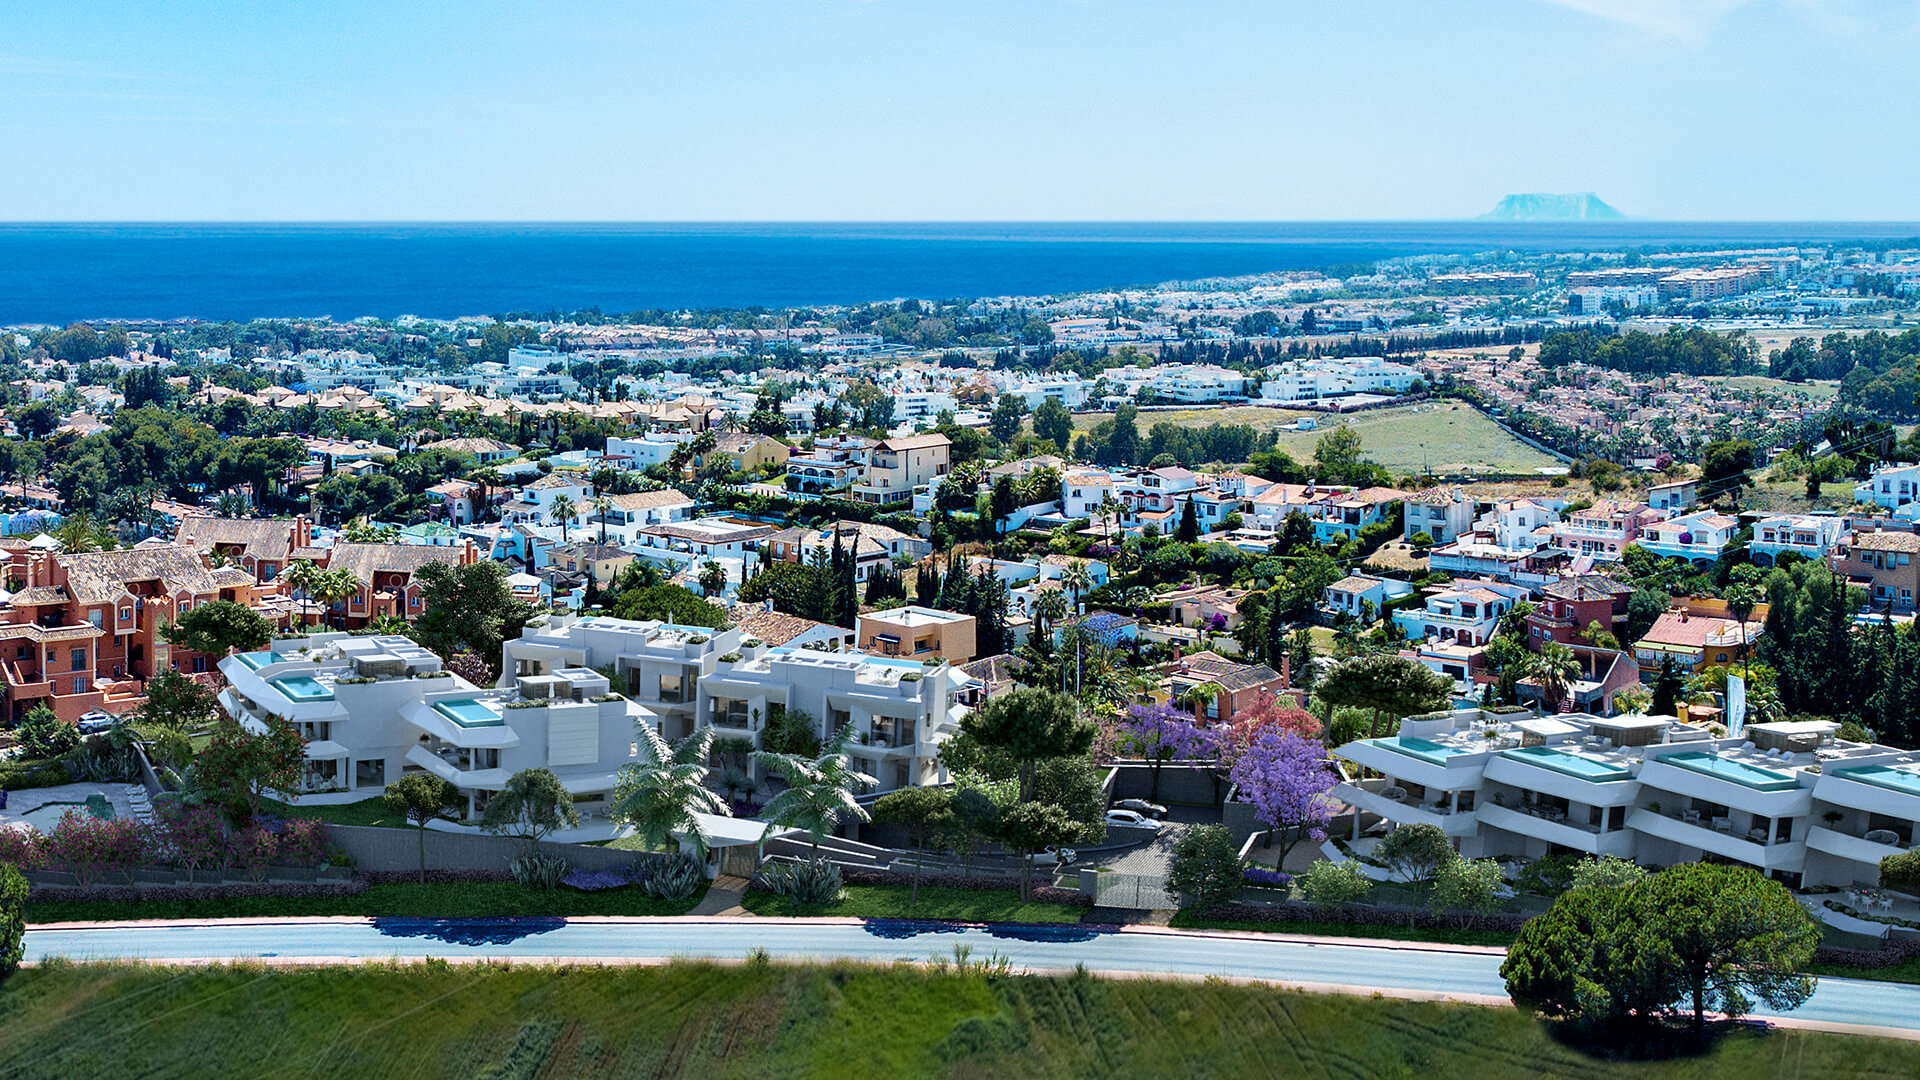 Celeste Marbella - Nueva Andalucia